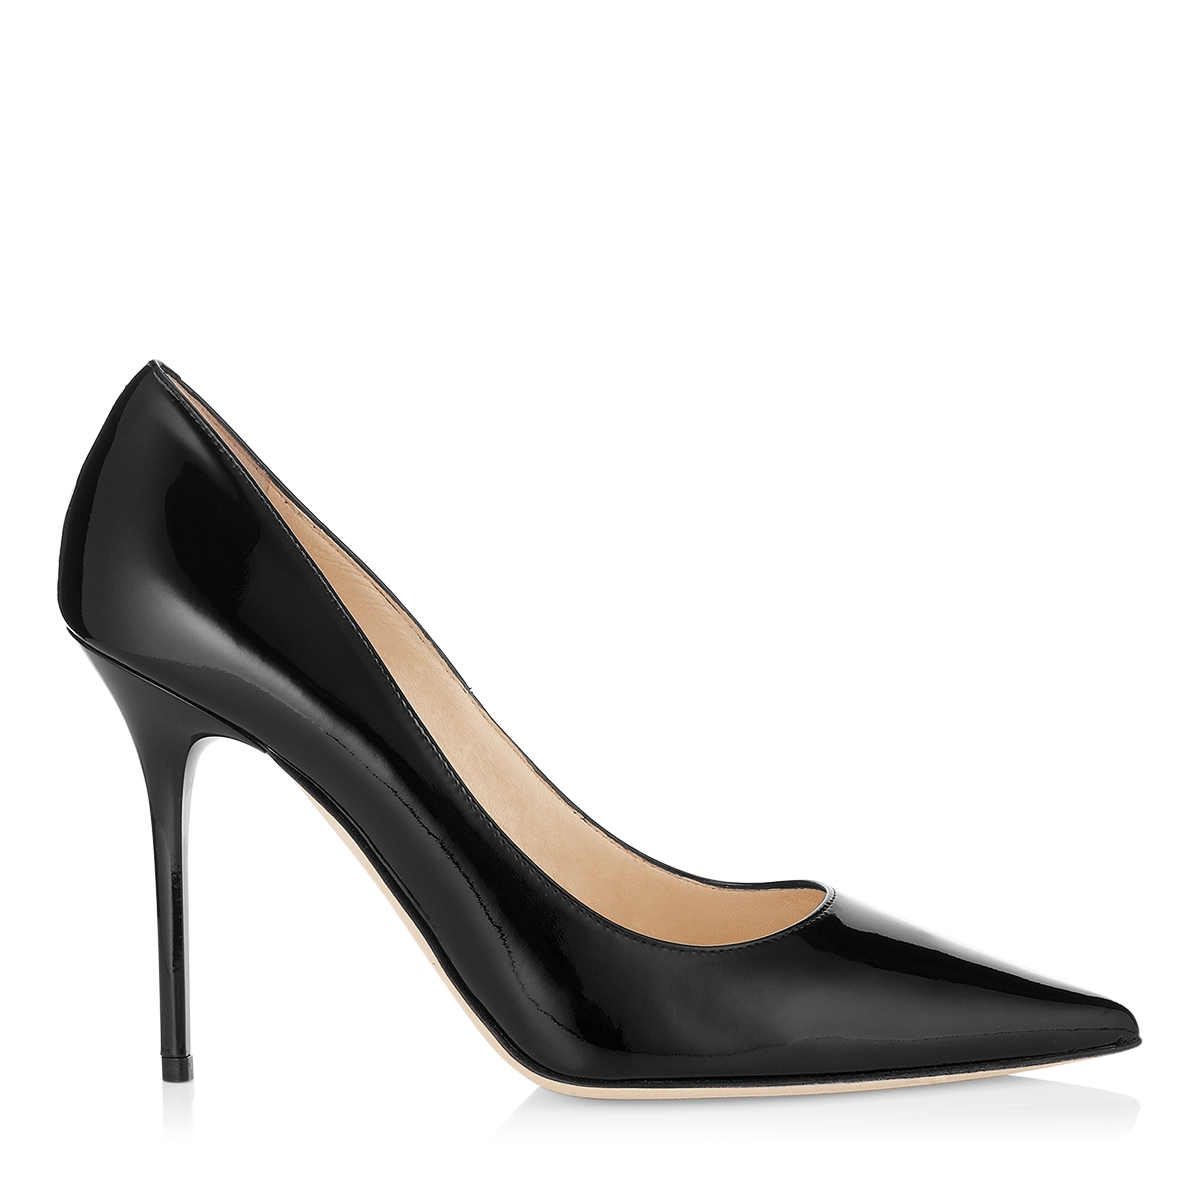 Black Suede Designer Pumps | Pointed Toe Shoes | Agnes | JIMMY CHOO Pumps